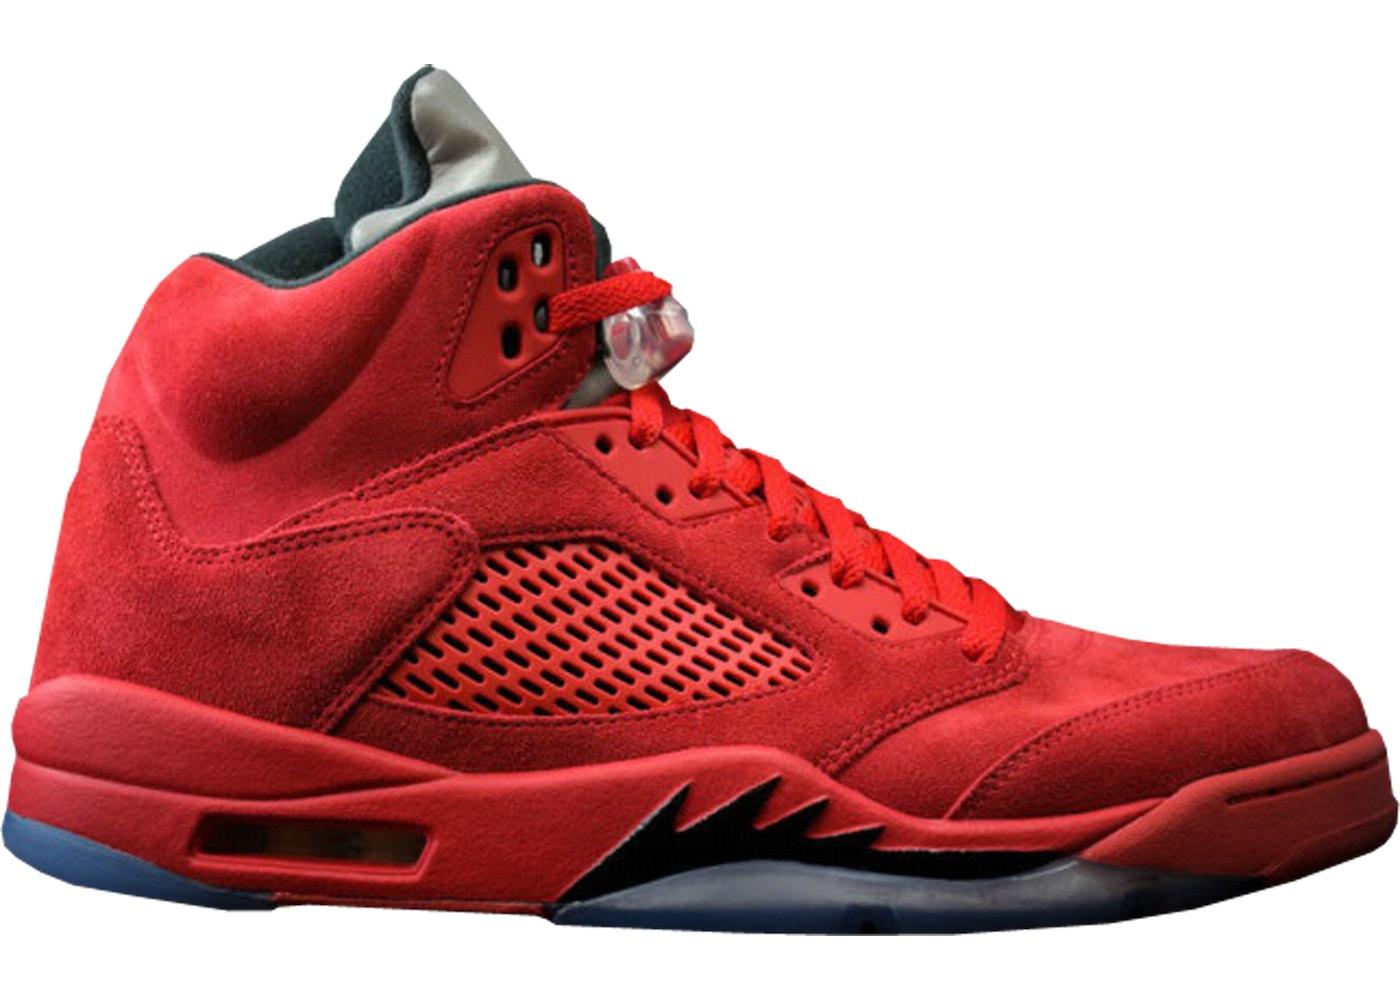 new arrival b3f5a 1e994 Nike Air Jordan 5 Retro Red Suede (University Red Black) Jordan 5 Retro Red  Suede - 136027-602 ...